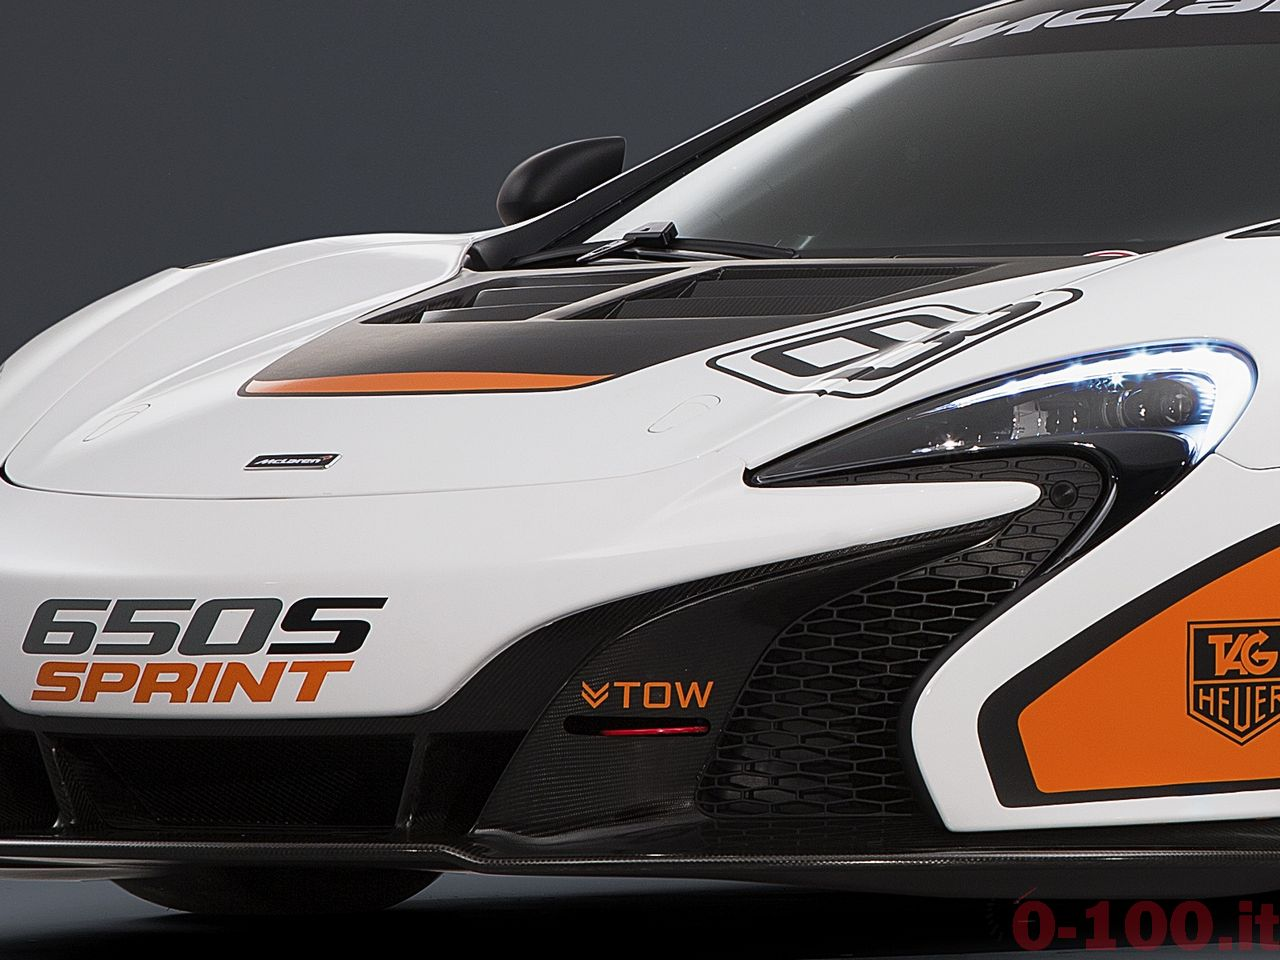 mclaren-650s-sprint-0-100-price-prezzo_7